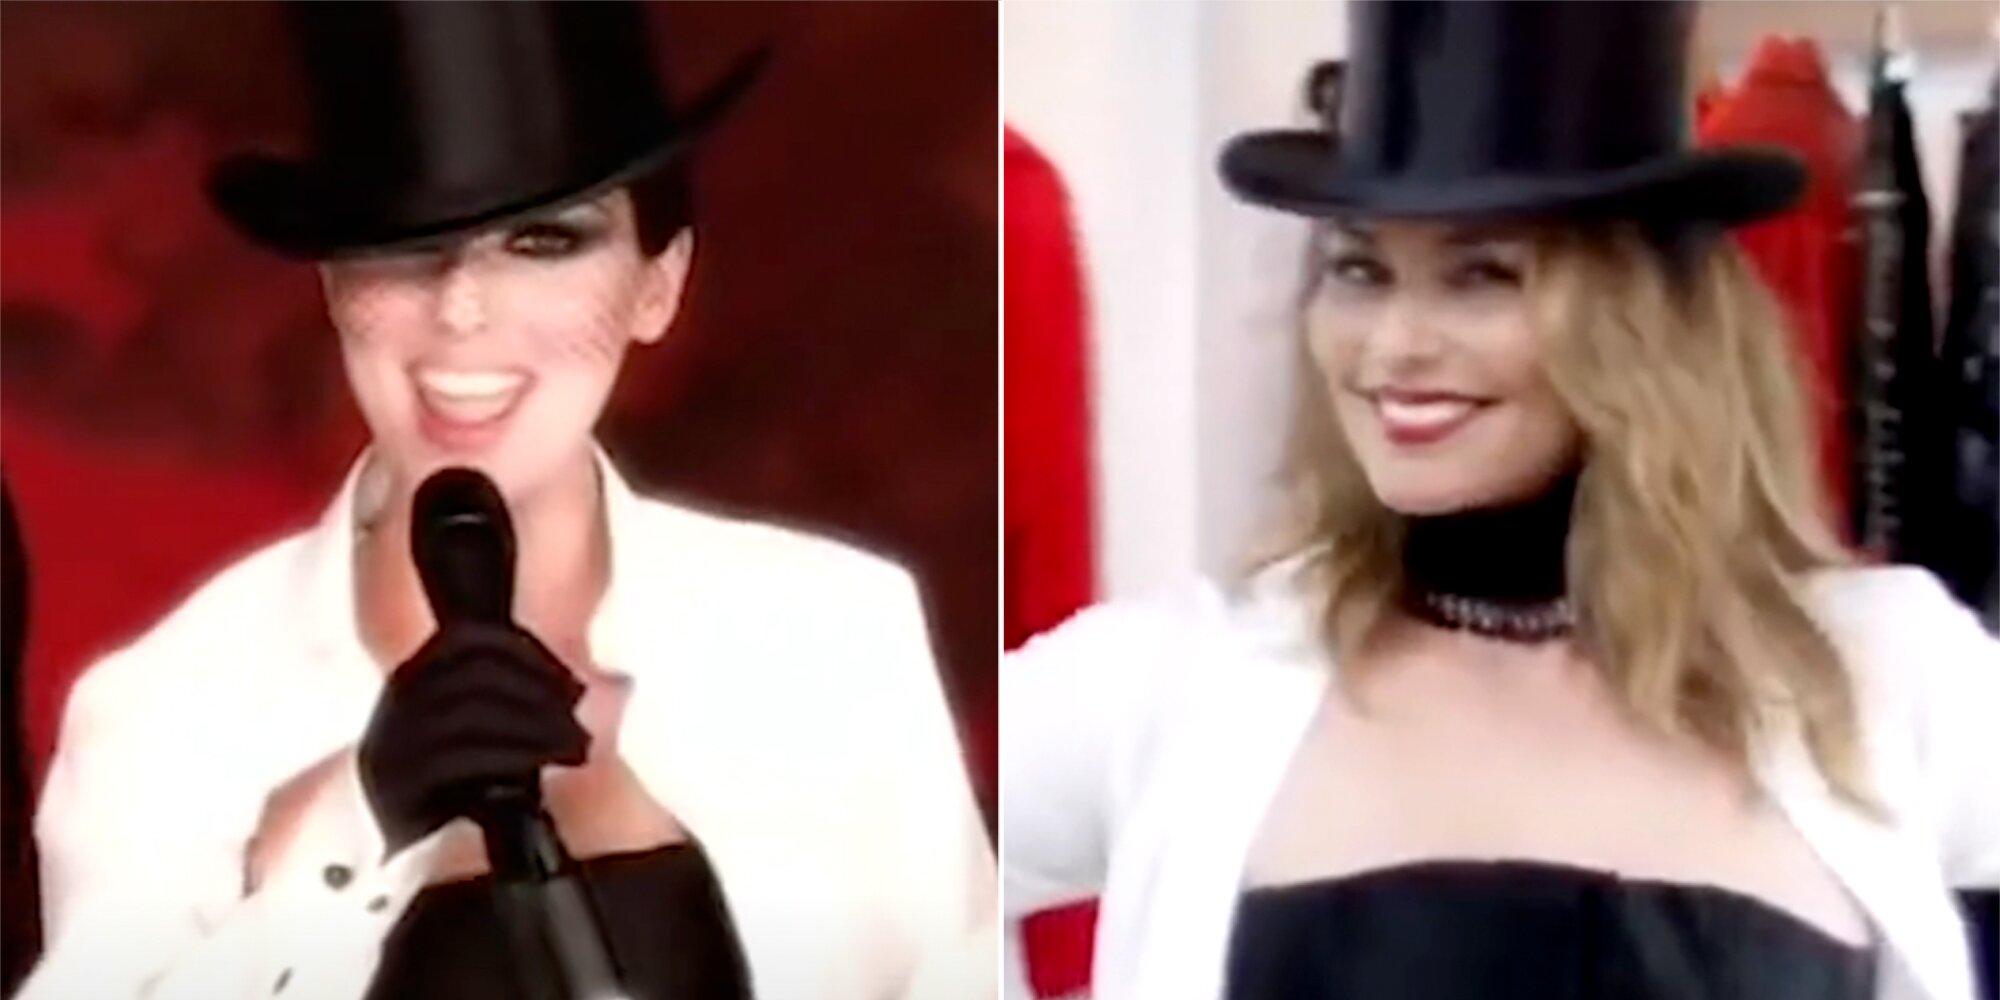 Watch Shania Twain rock her 'Man! I Feel Like a Woman' dress 20 years later.jpg